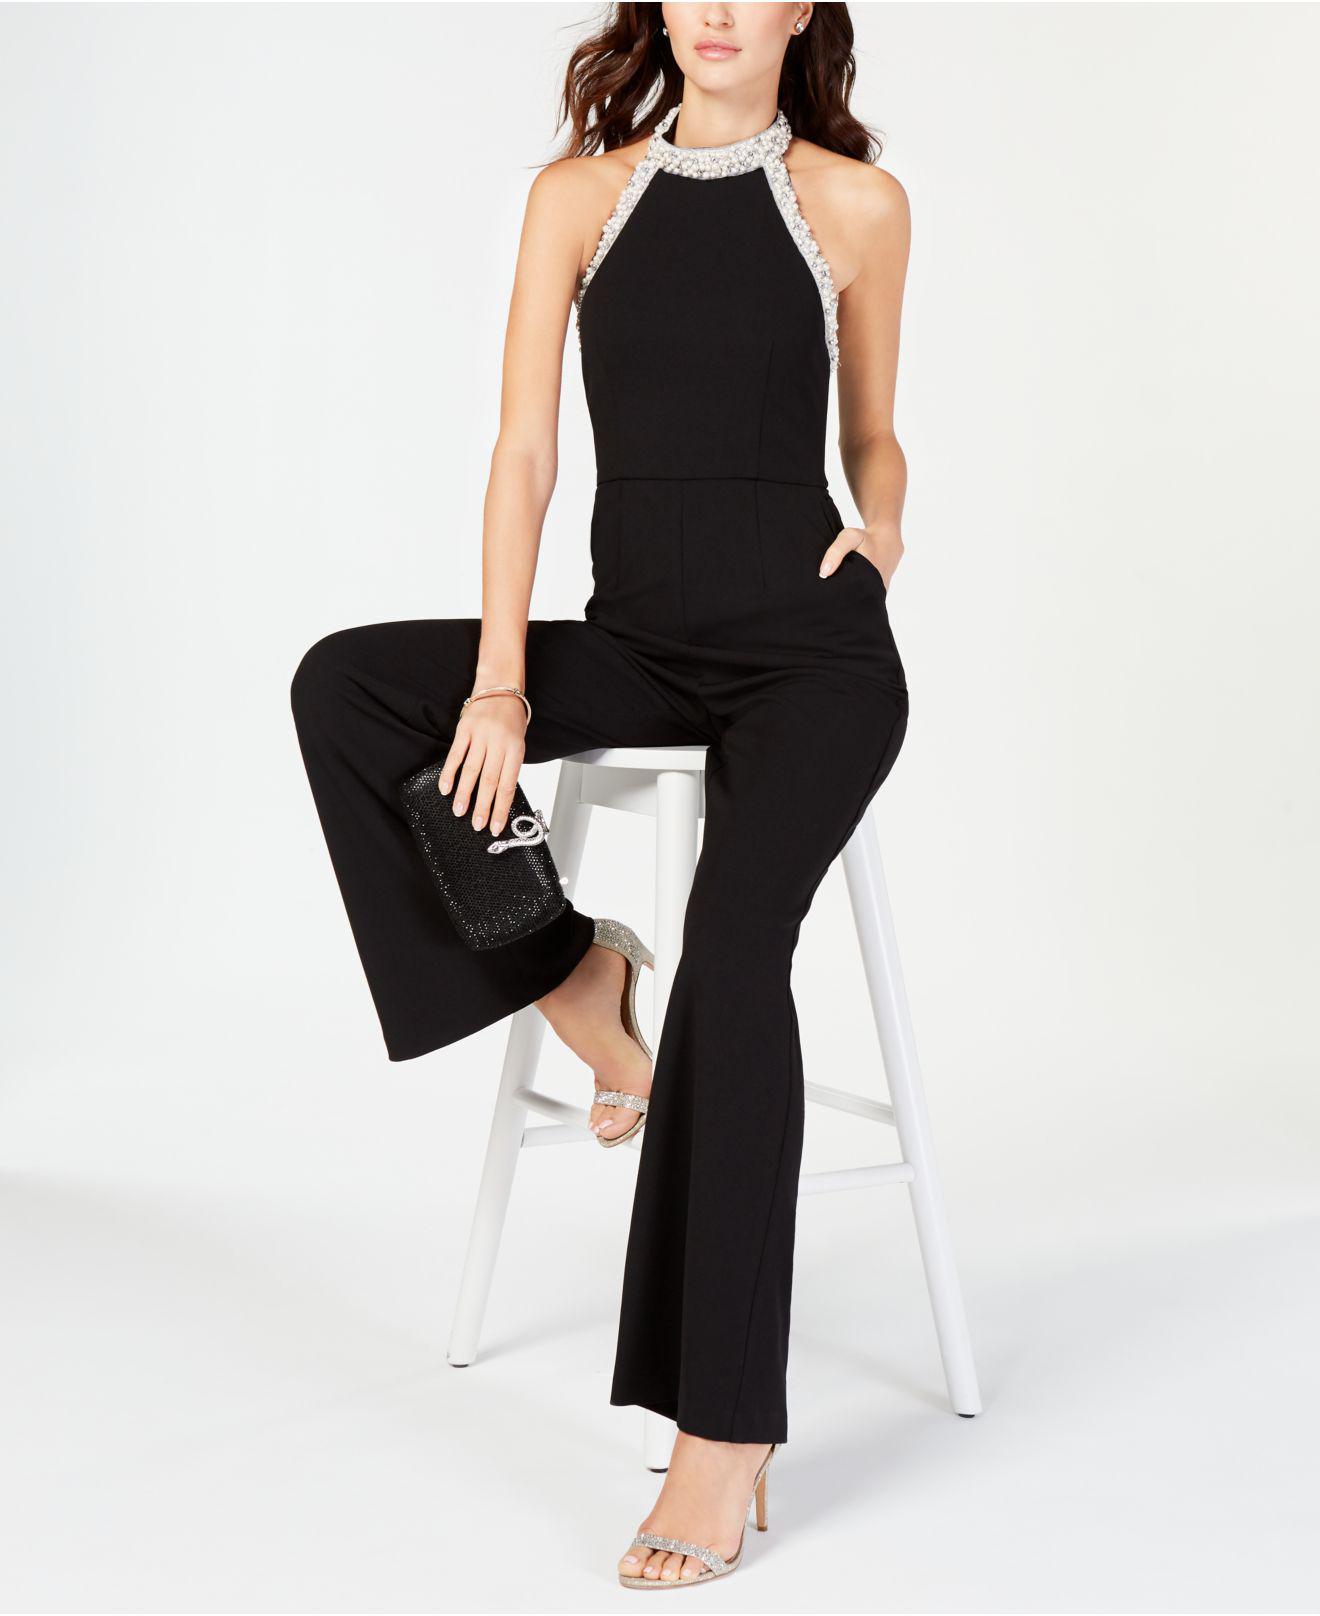 98fc58b601ac Adrianna Papell - Black Petite Beaded-halter Jumpsuit - Lyst. View  fullscreen